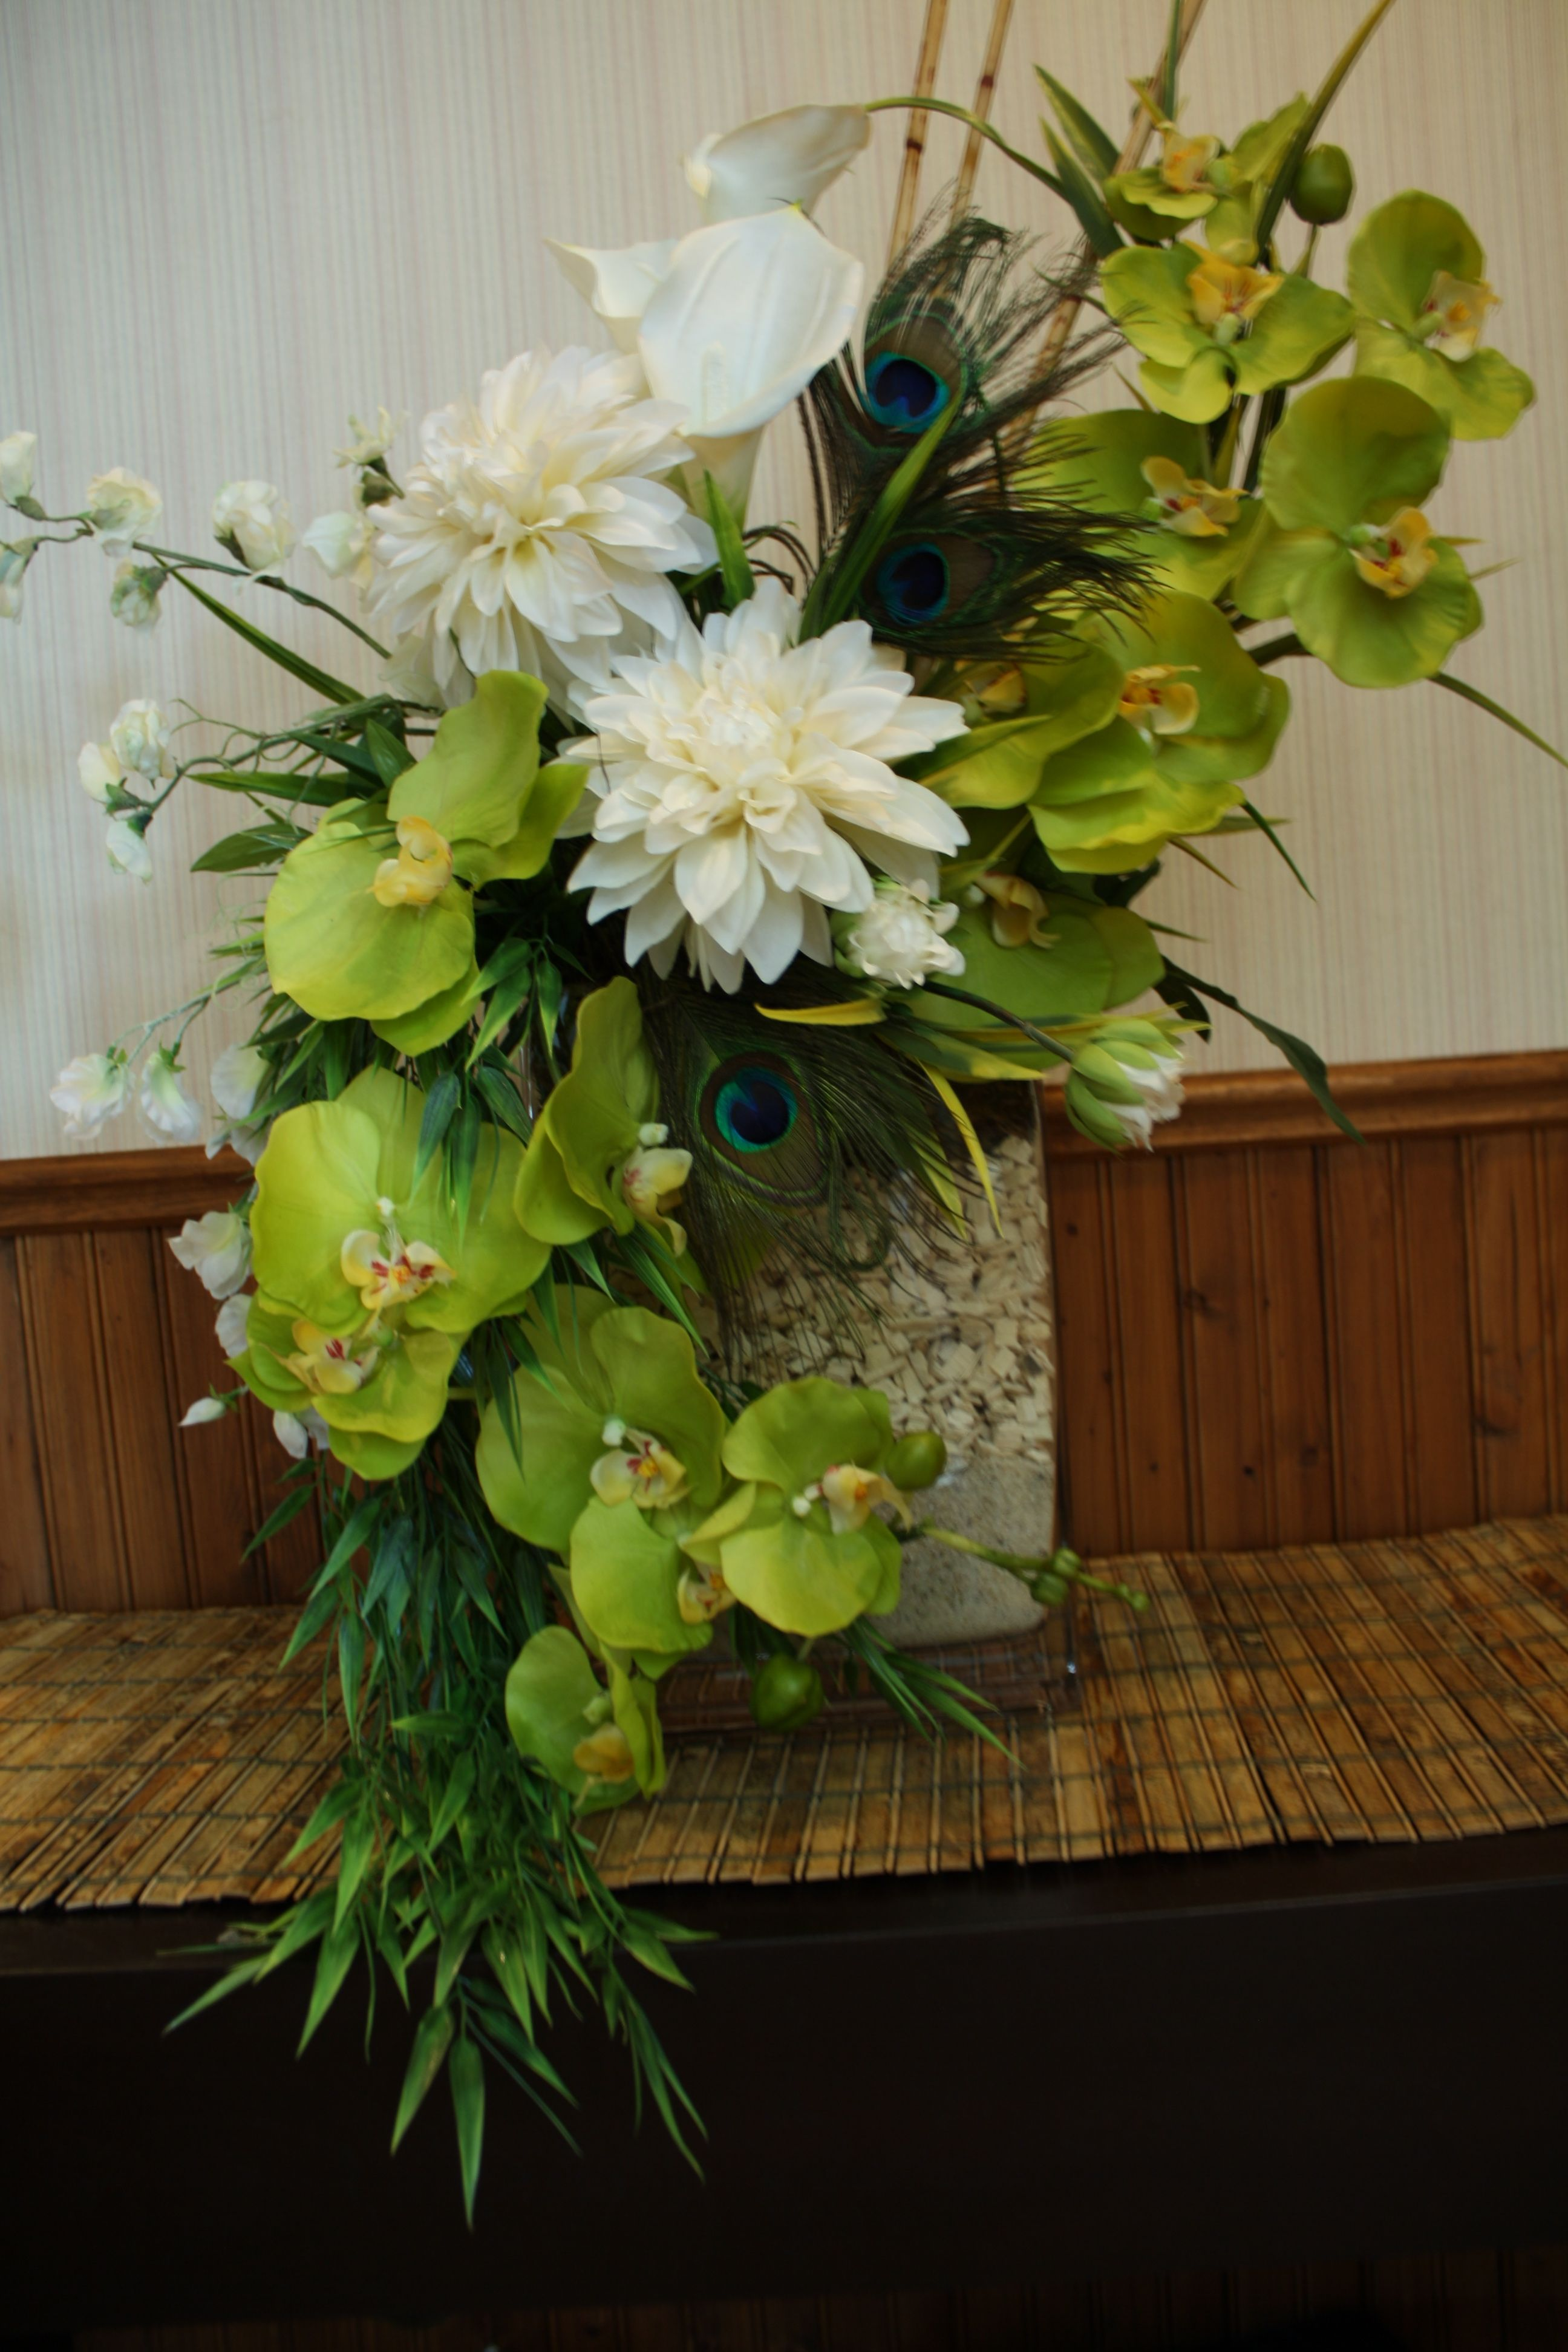 Silk Floral Design A Minimalist Design With A Spring Inspiration